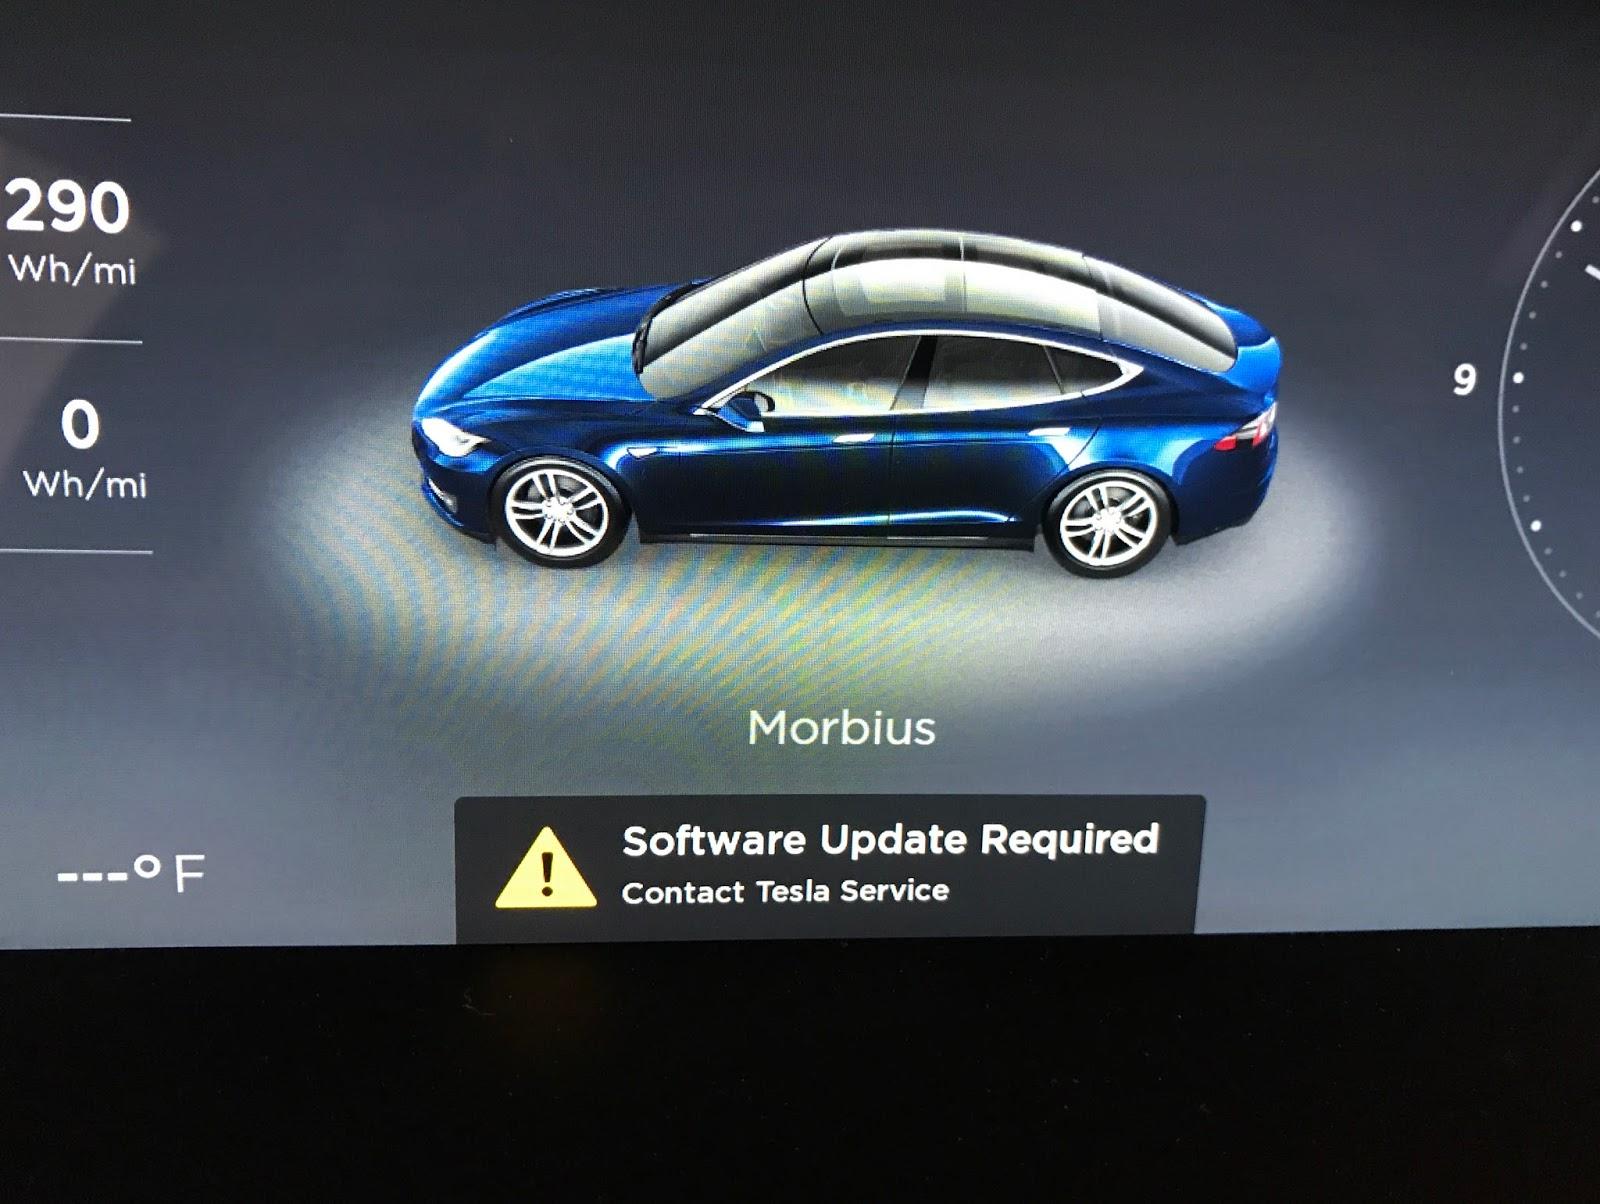 How to update tesla software